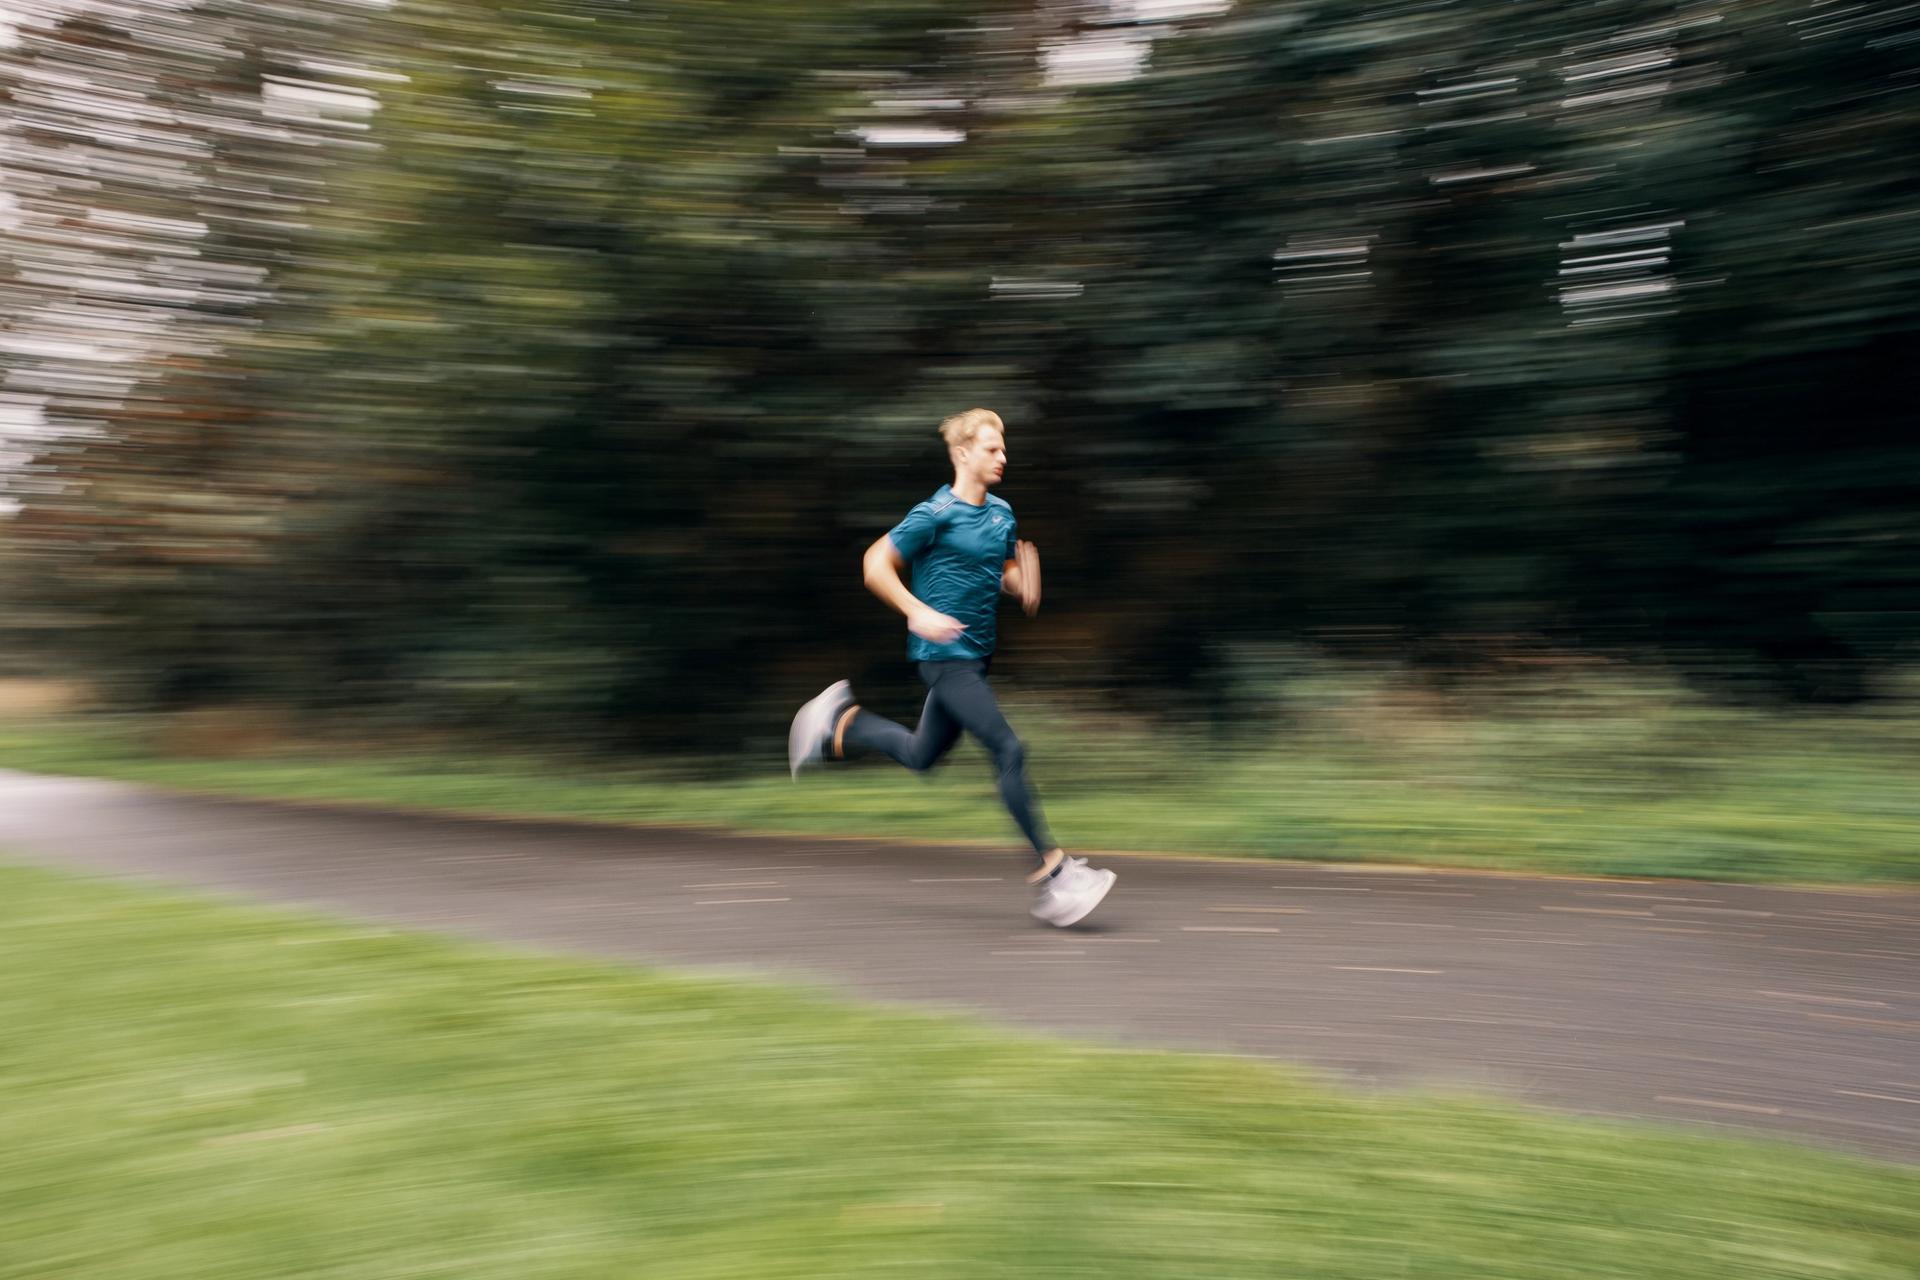 Løper